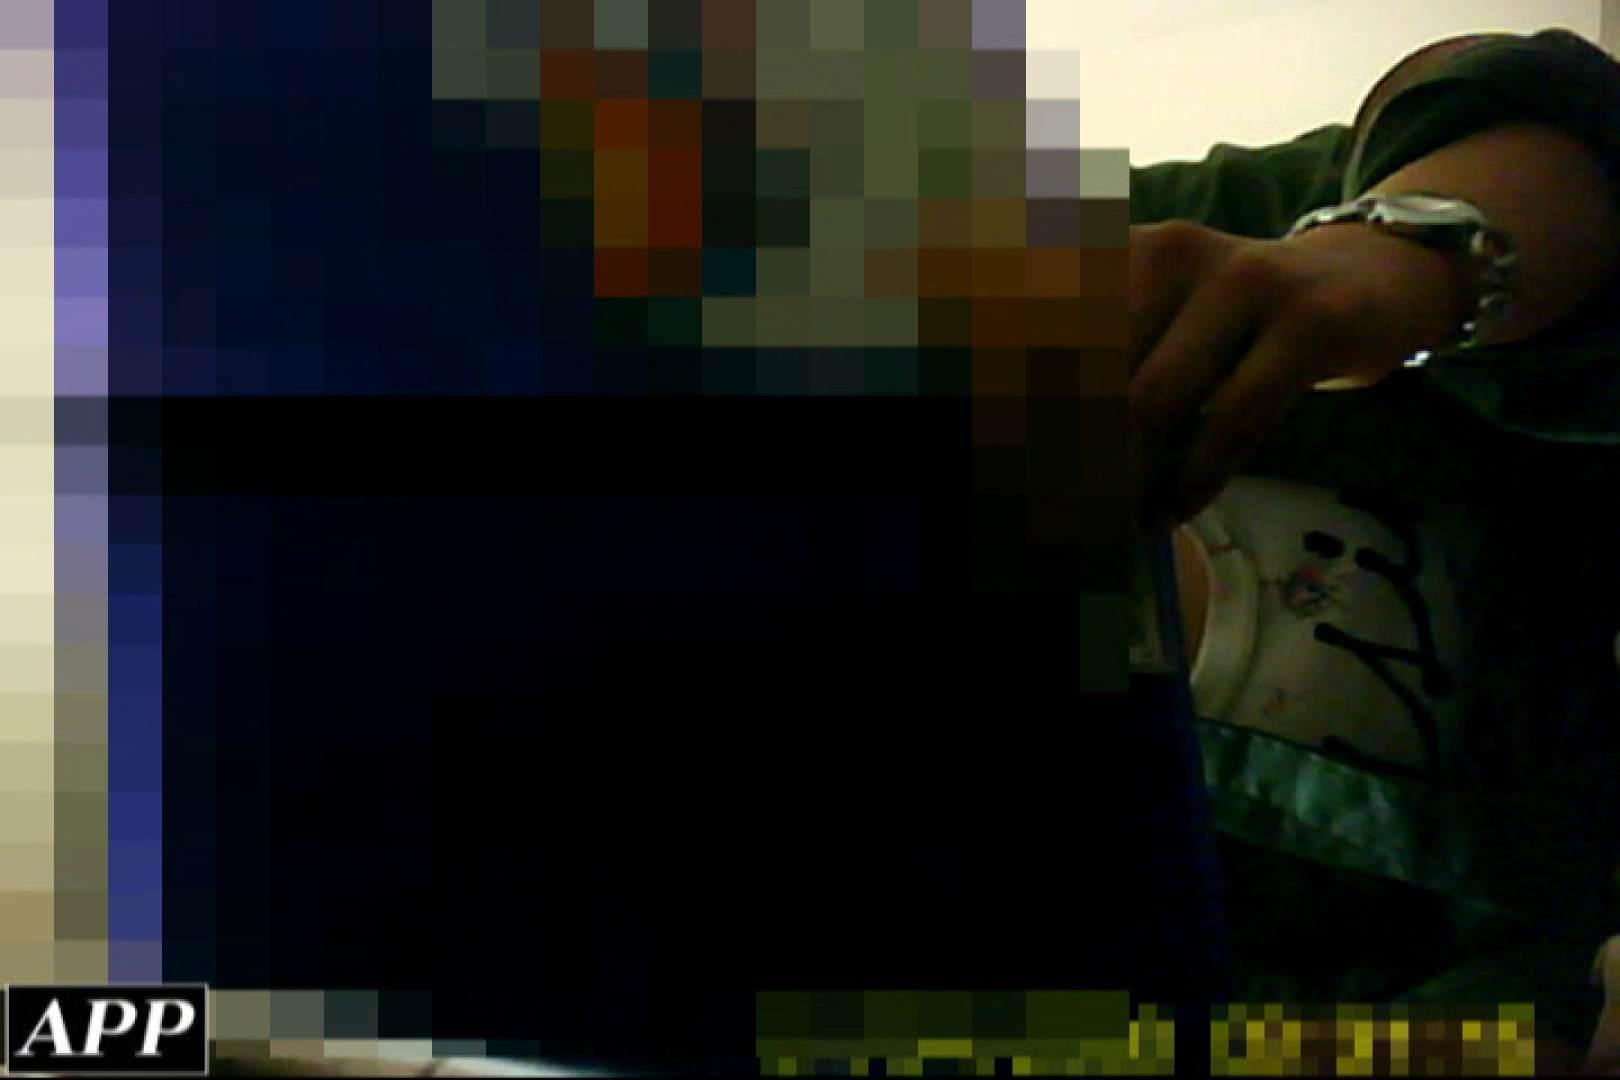 3視点洗面所 vol.118 洗面所 | OLセックス  88画像 61